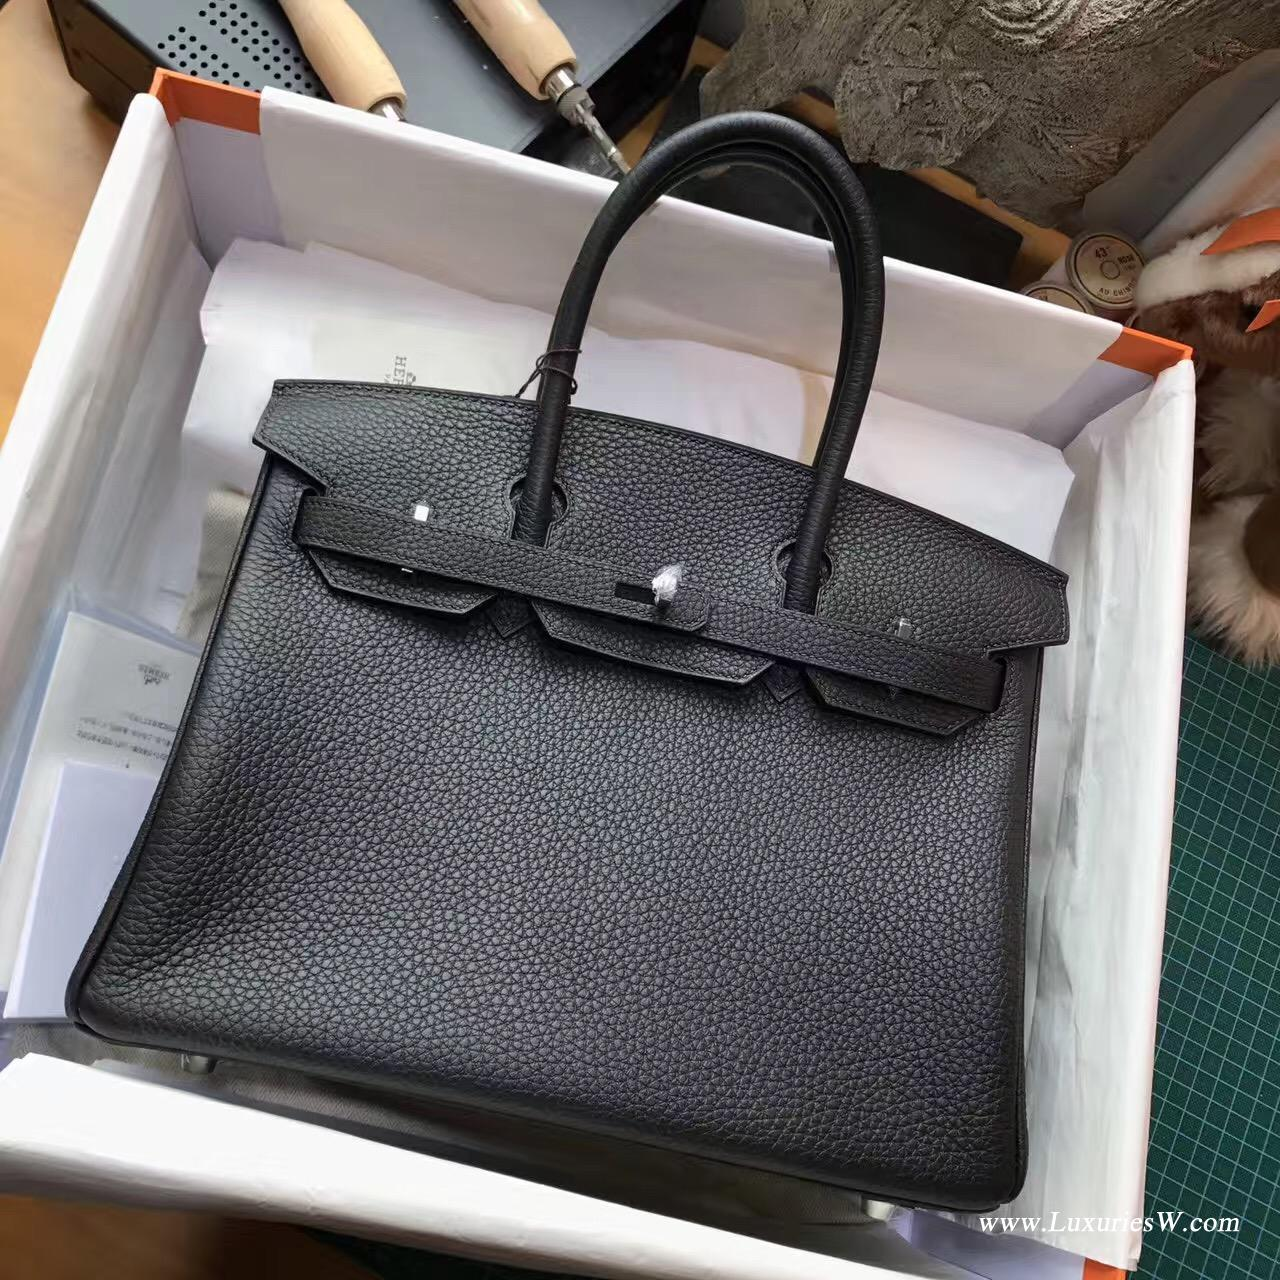 Hermes最出名的包袋鉑金包Birkin 30 togo 黑色 CK89 Nior 銀扣